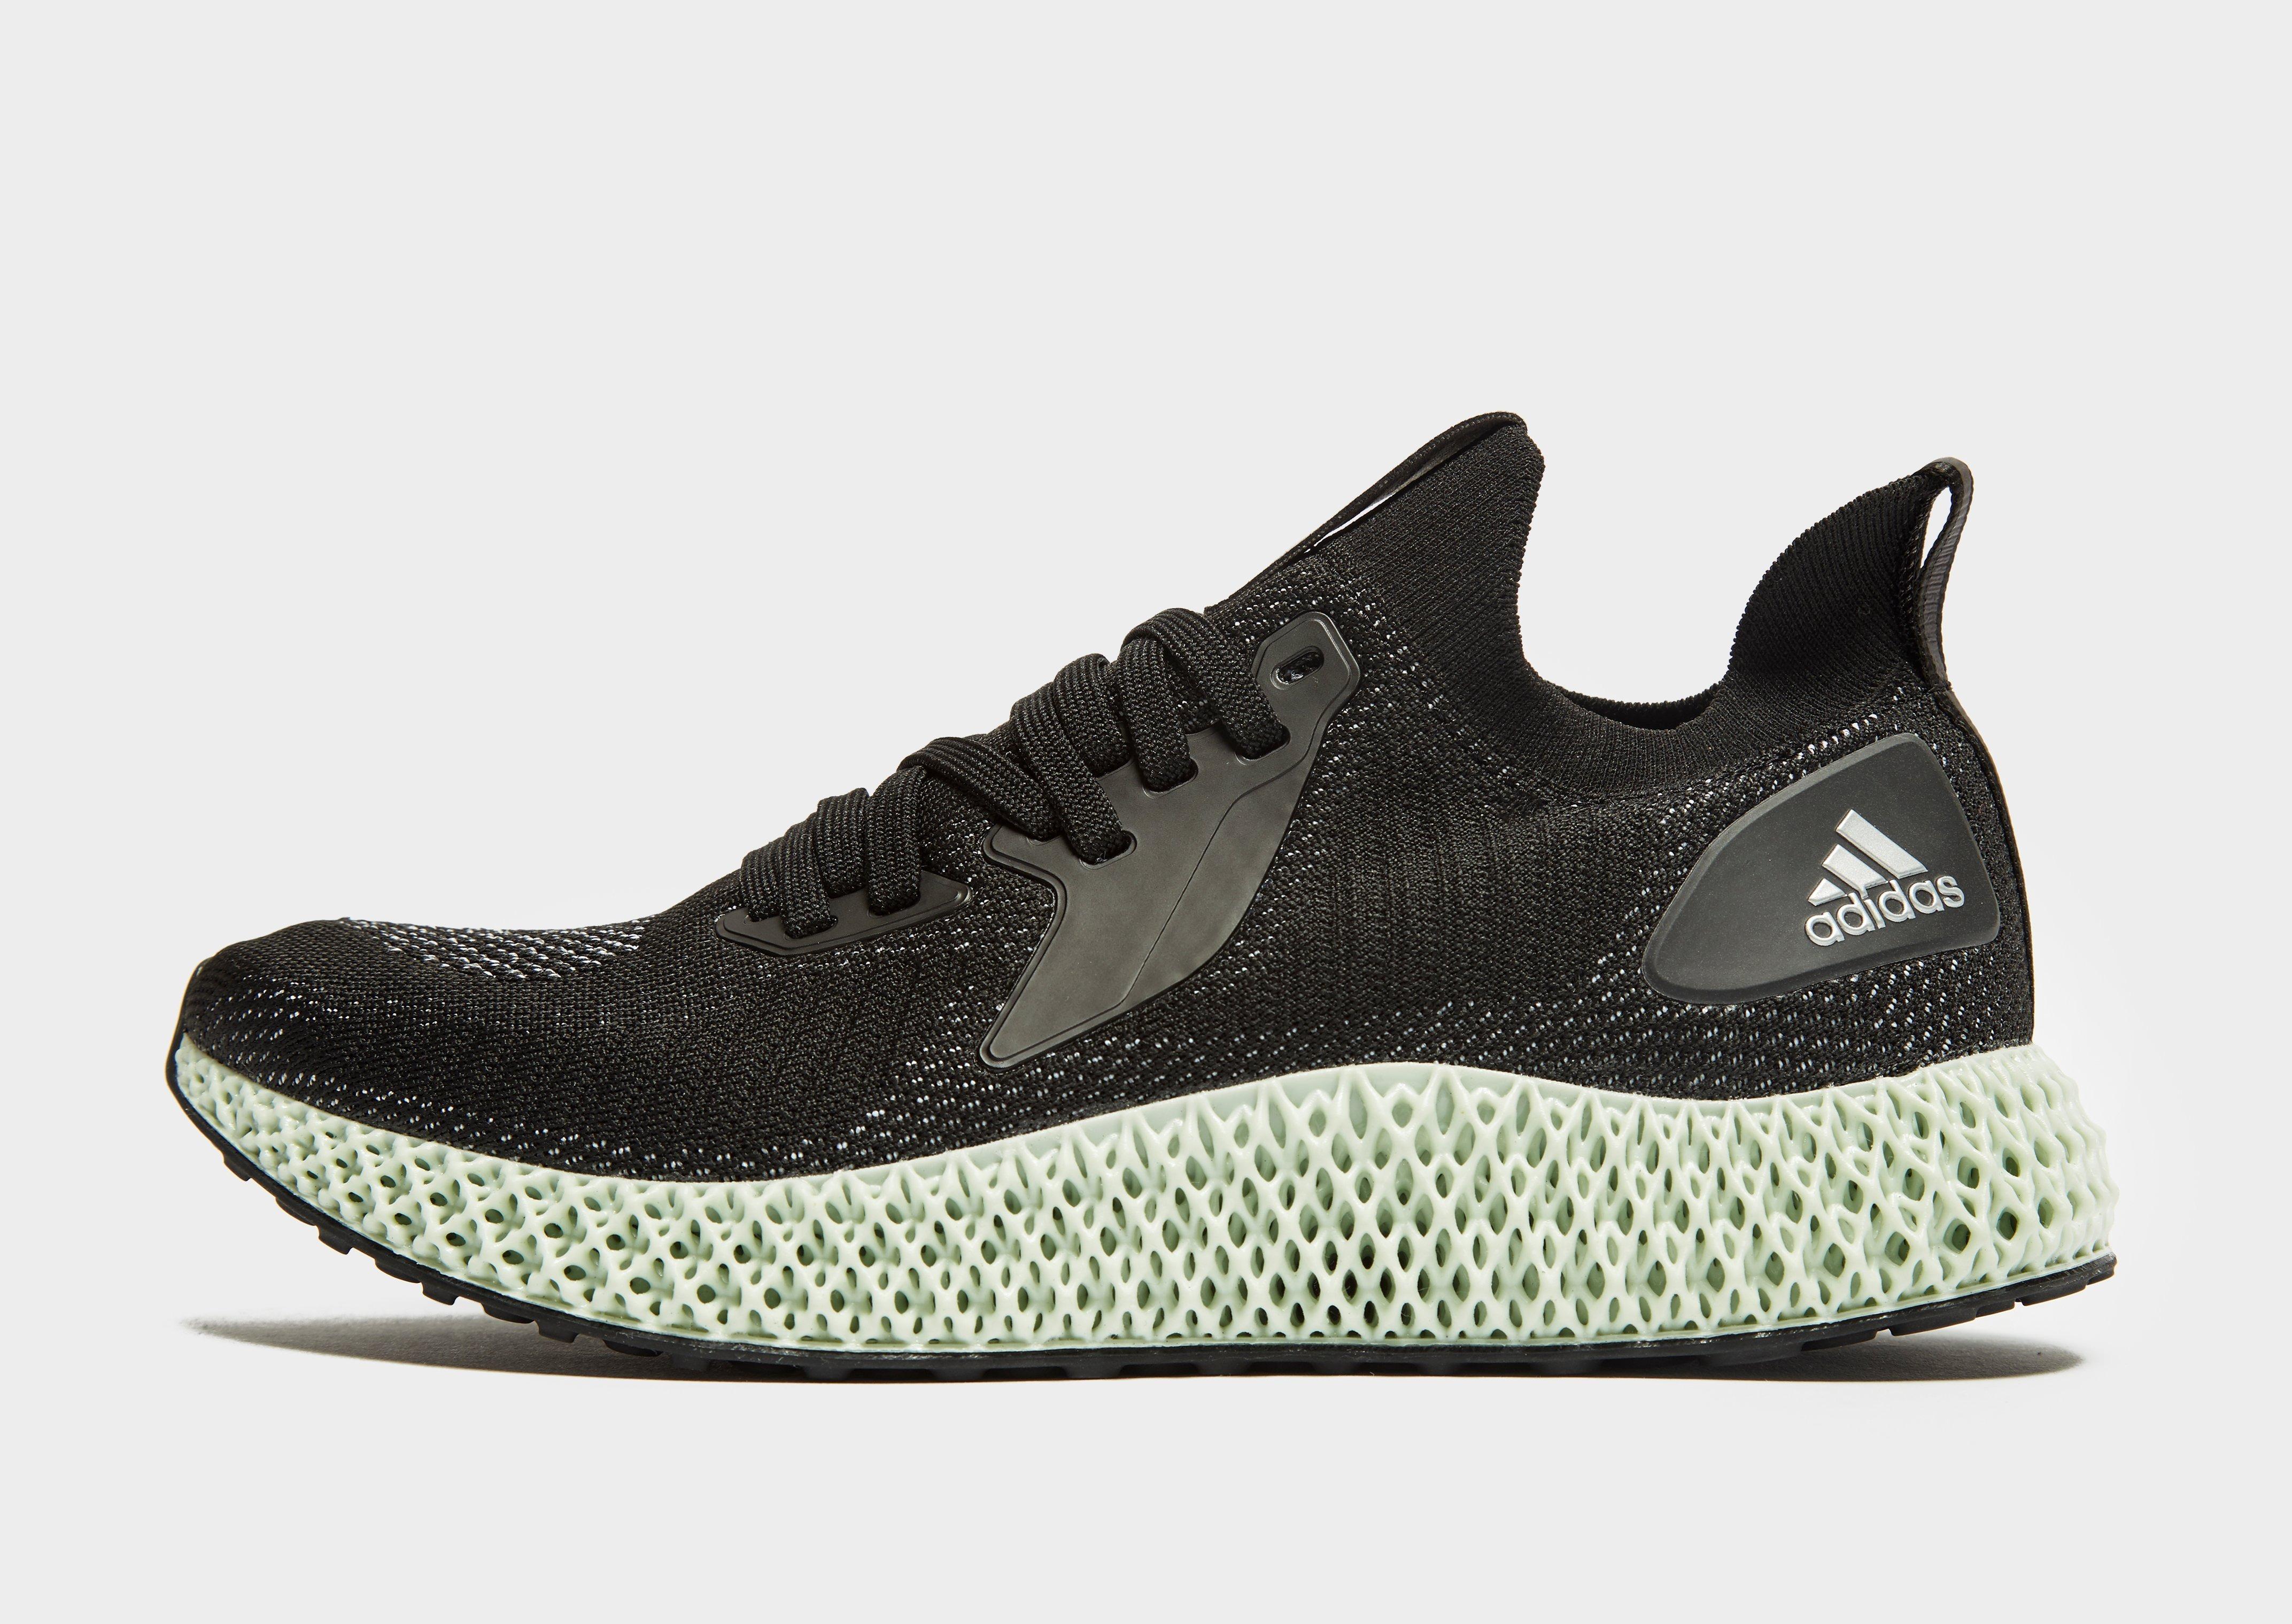 nike billigt schoenen, Herr Nike Free Run 2.0 Skor Carbon